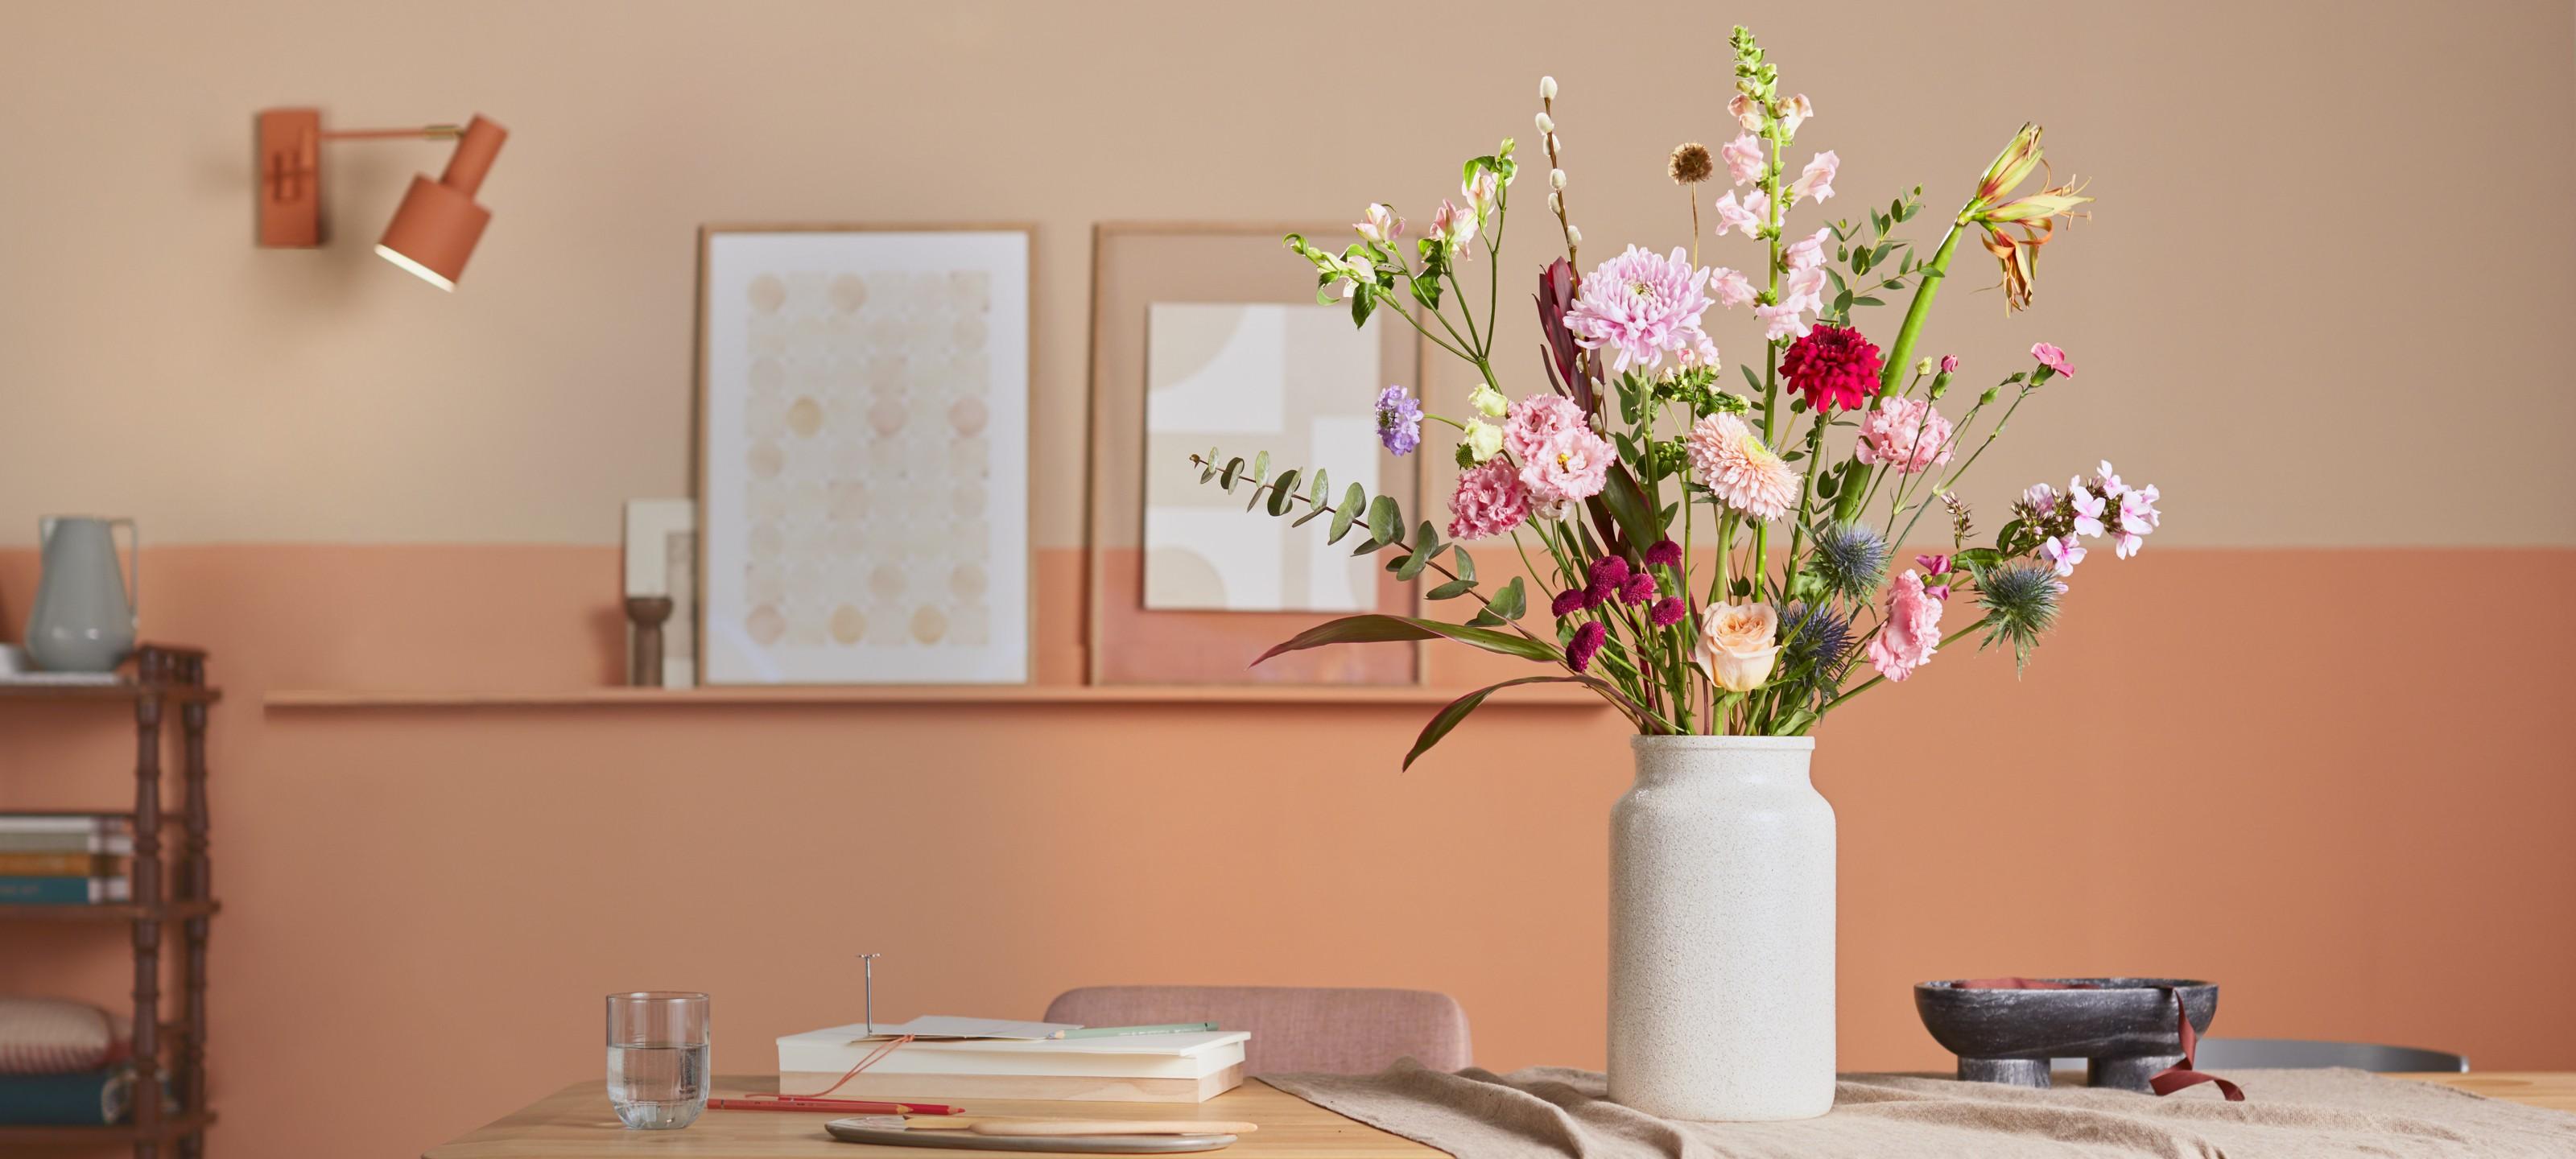 Gol Setan (Online flower delivery & Florist) - گل فروش آنلاین ...